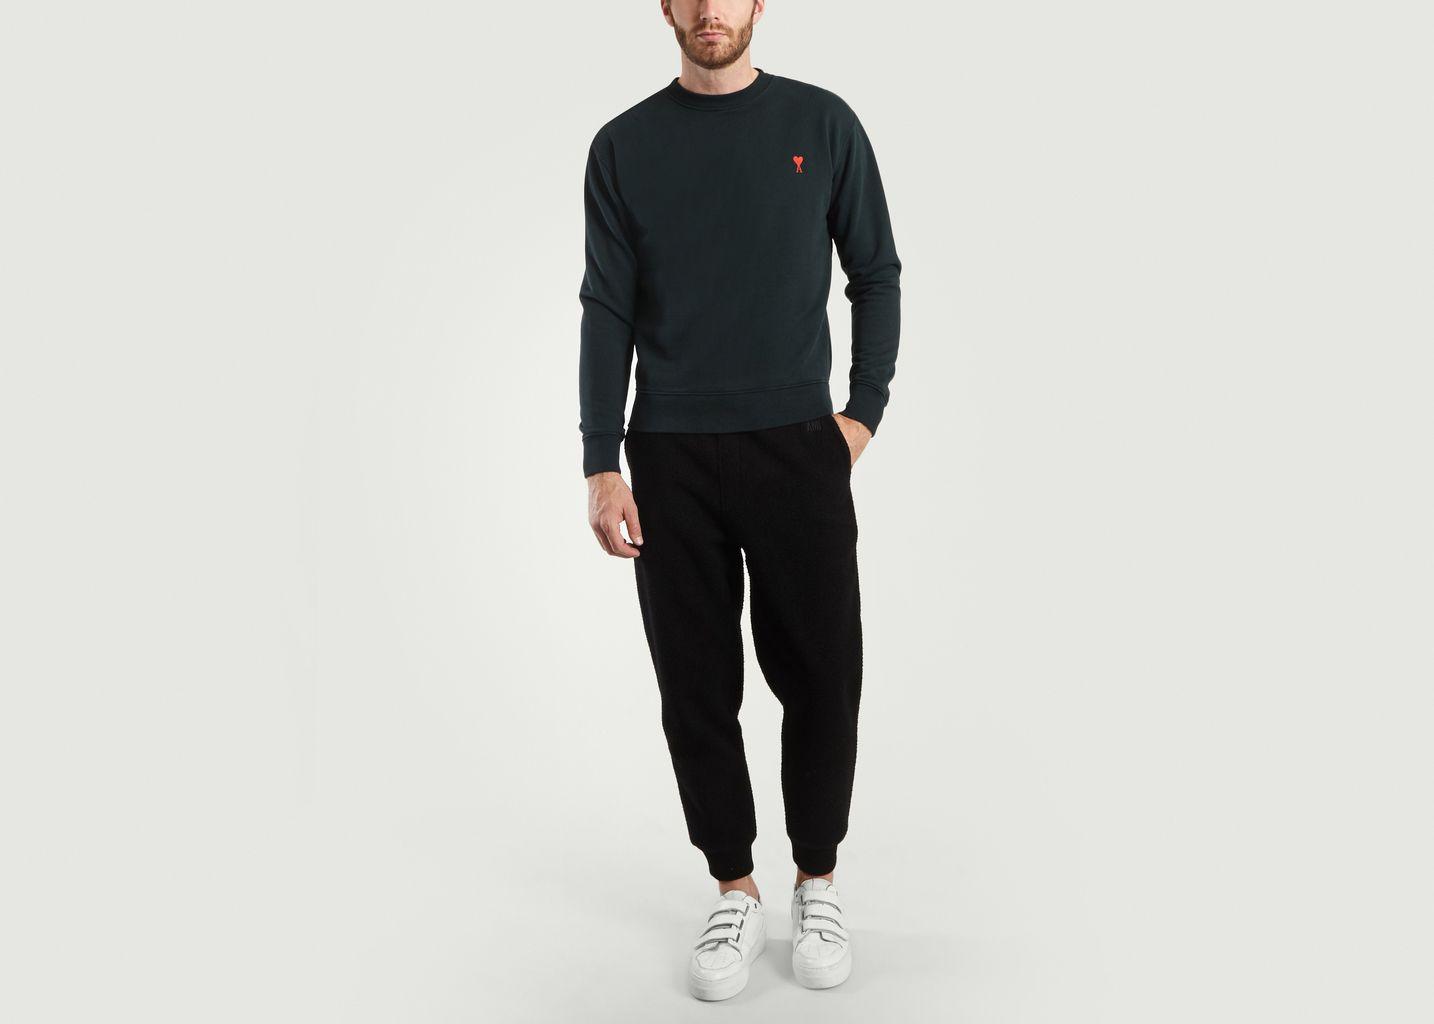 Sweatshirt Ami de Coeur - AMI Alexandre Mattiussi